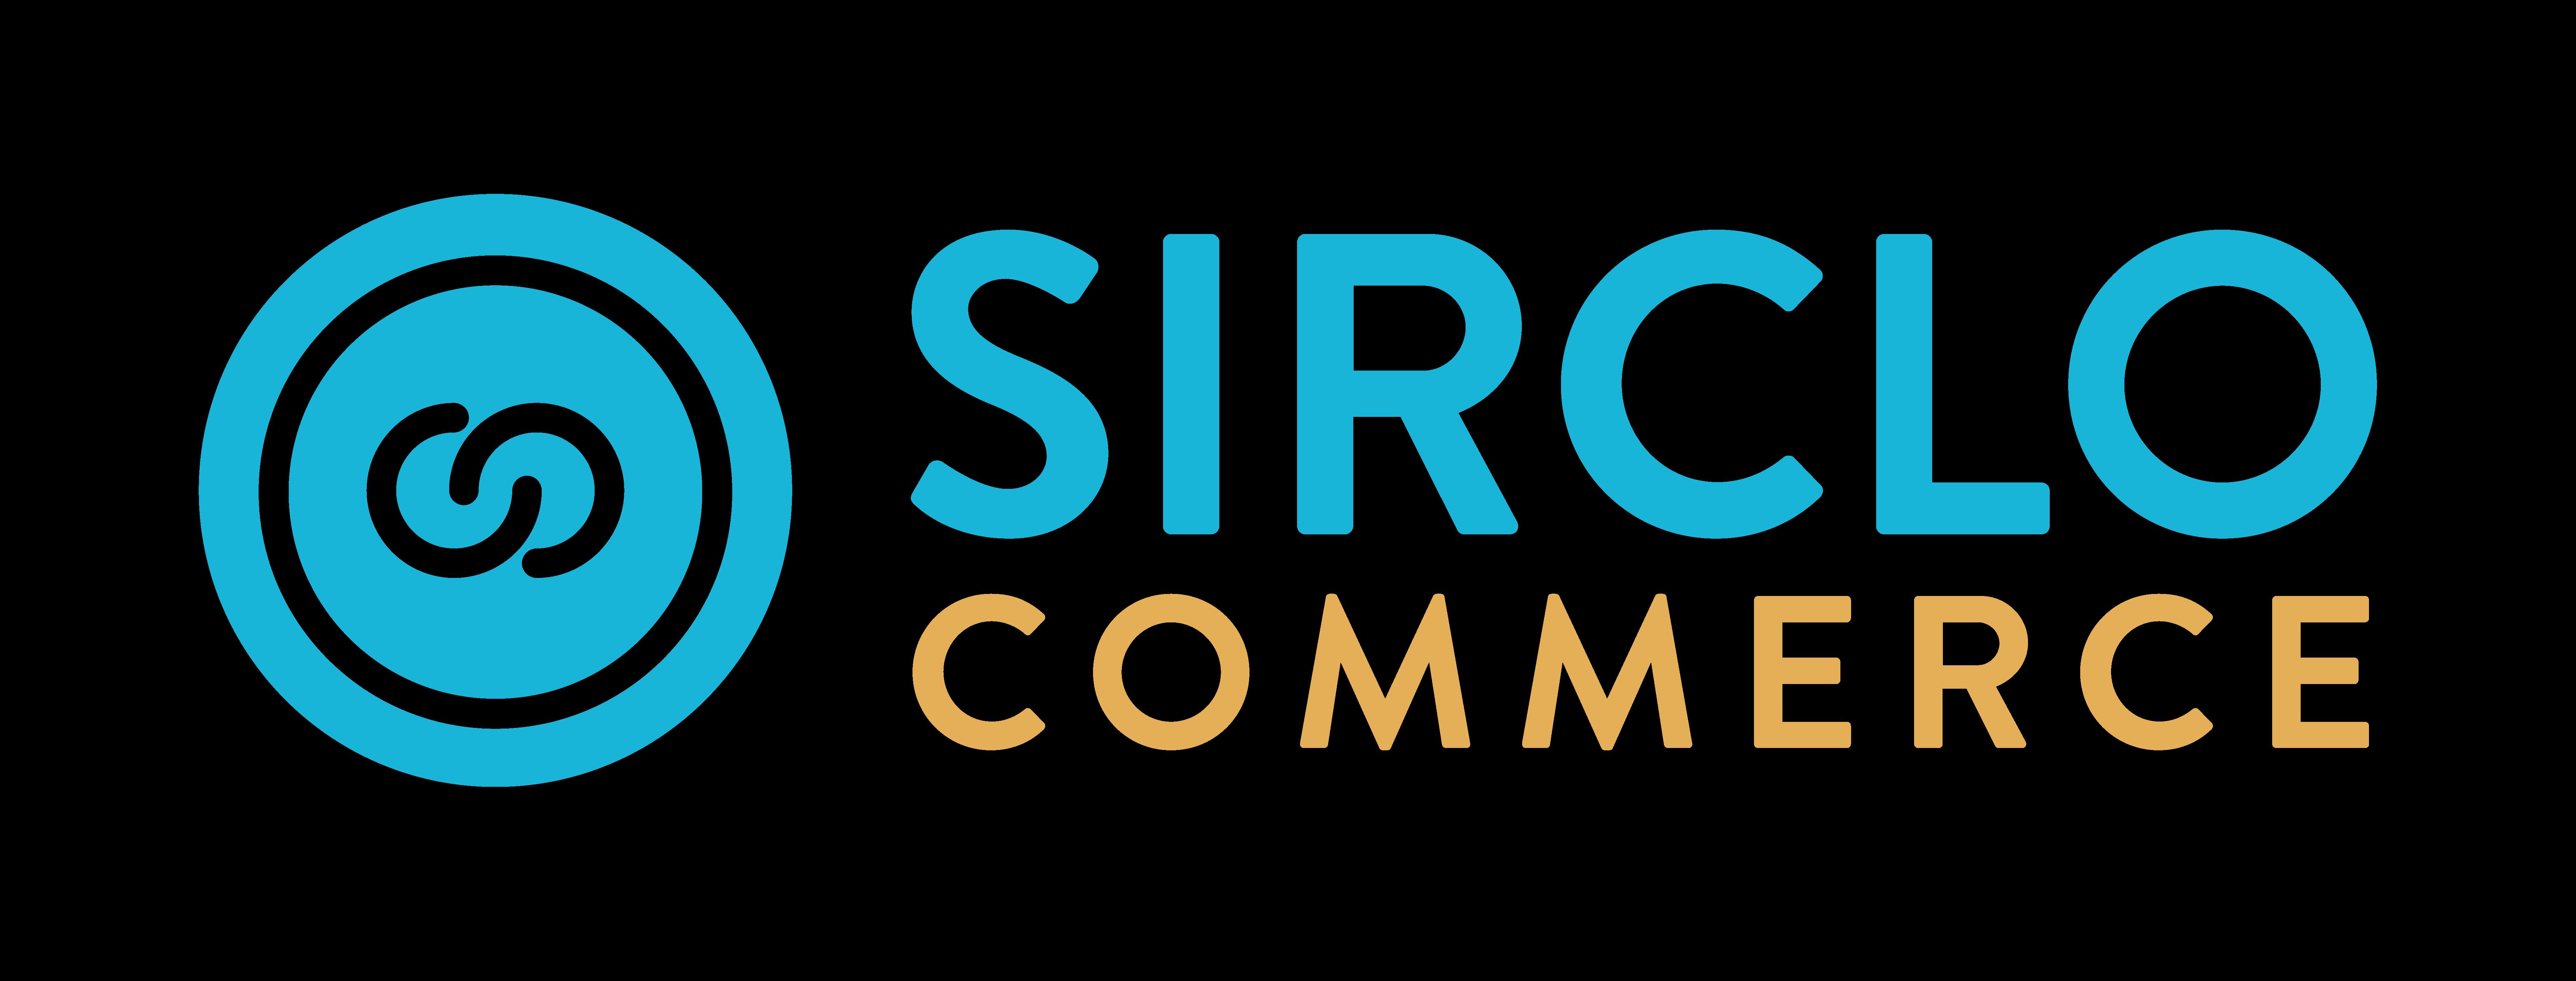 Sirclo image